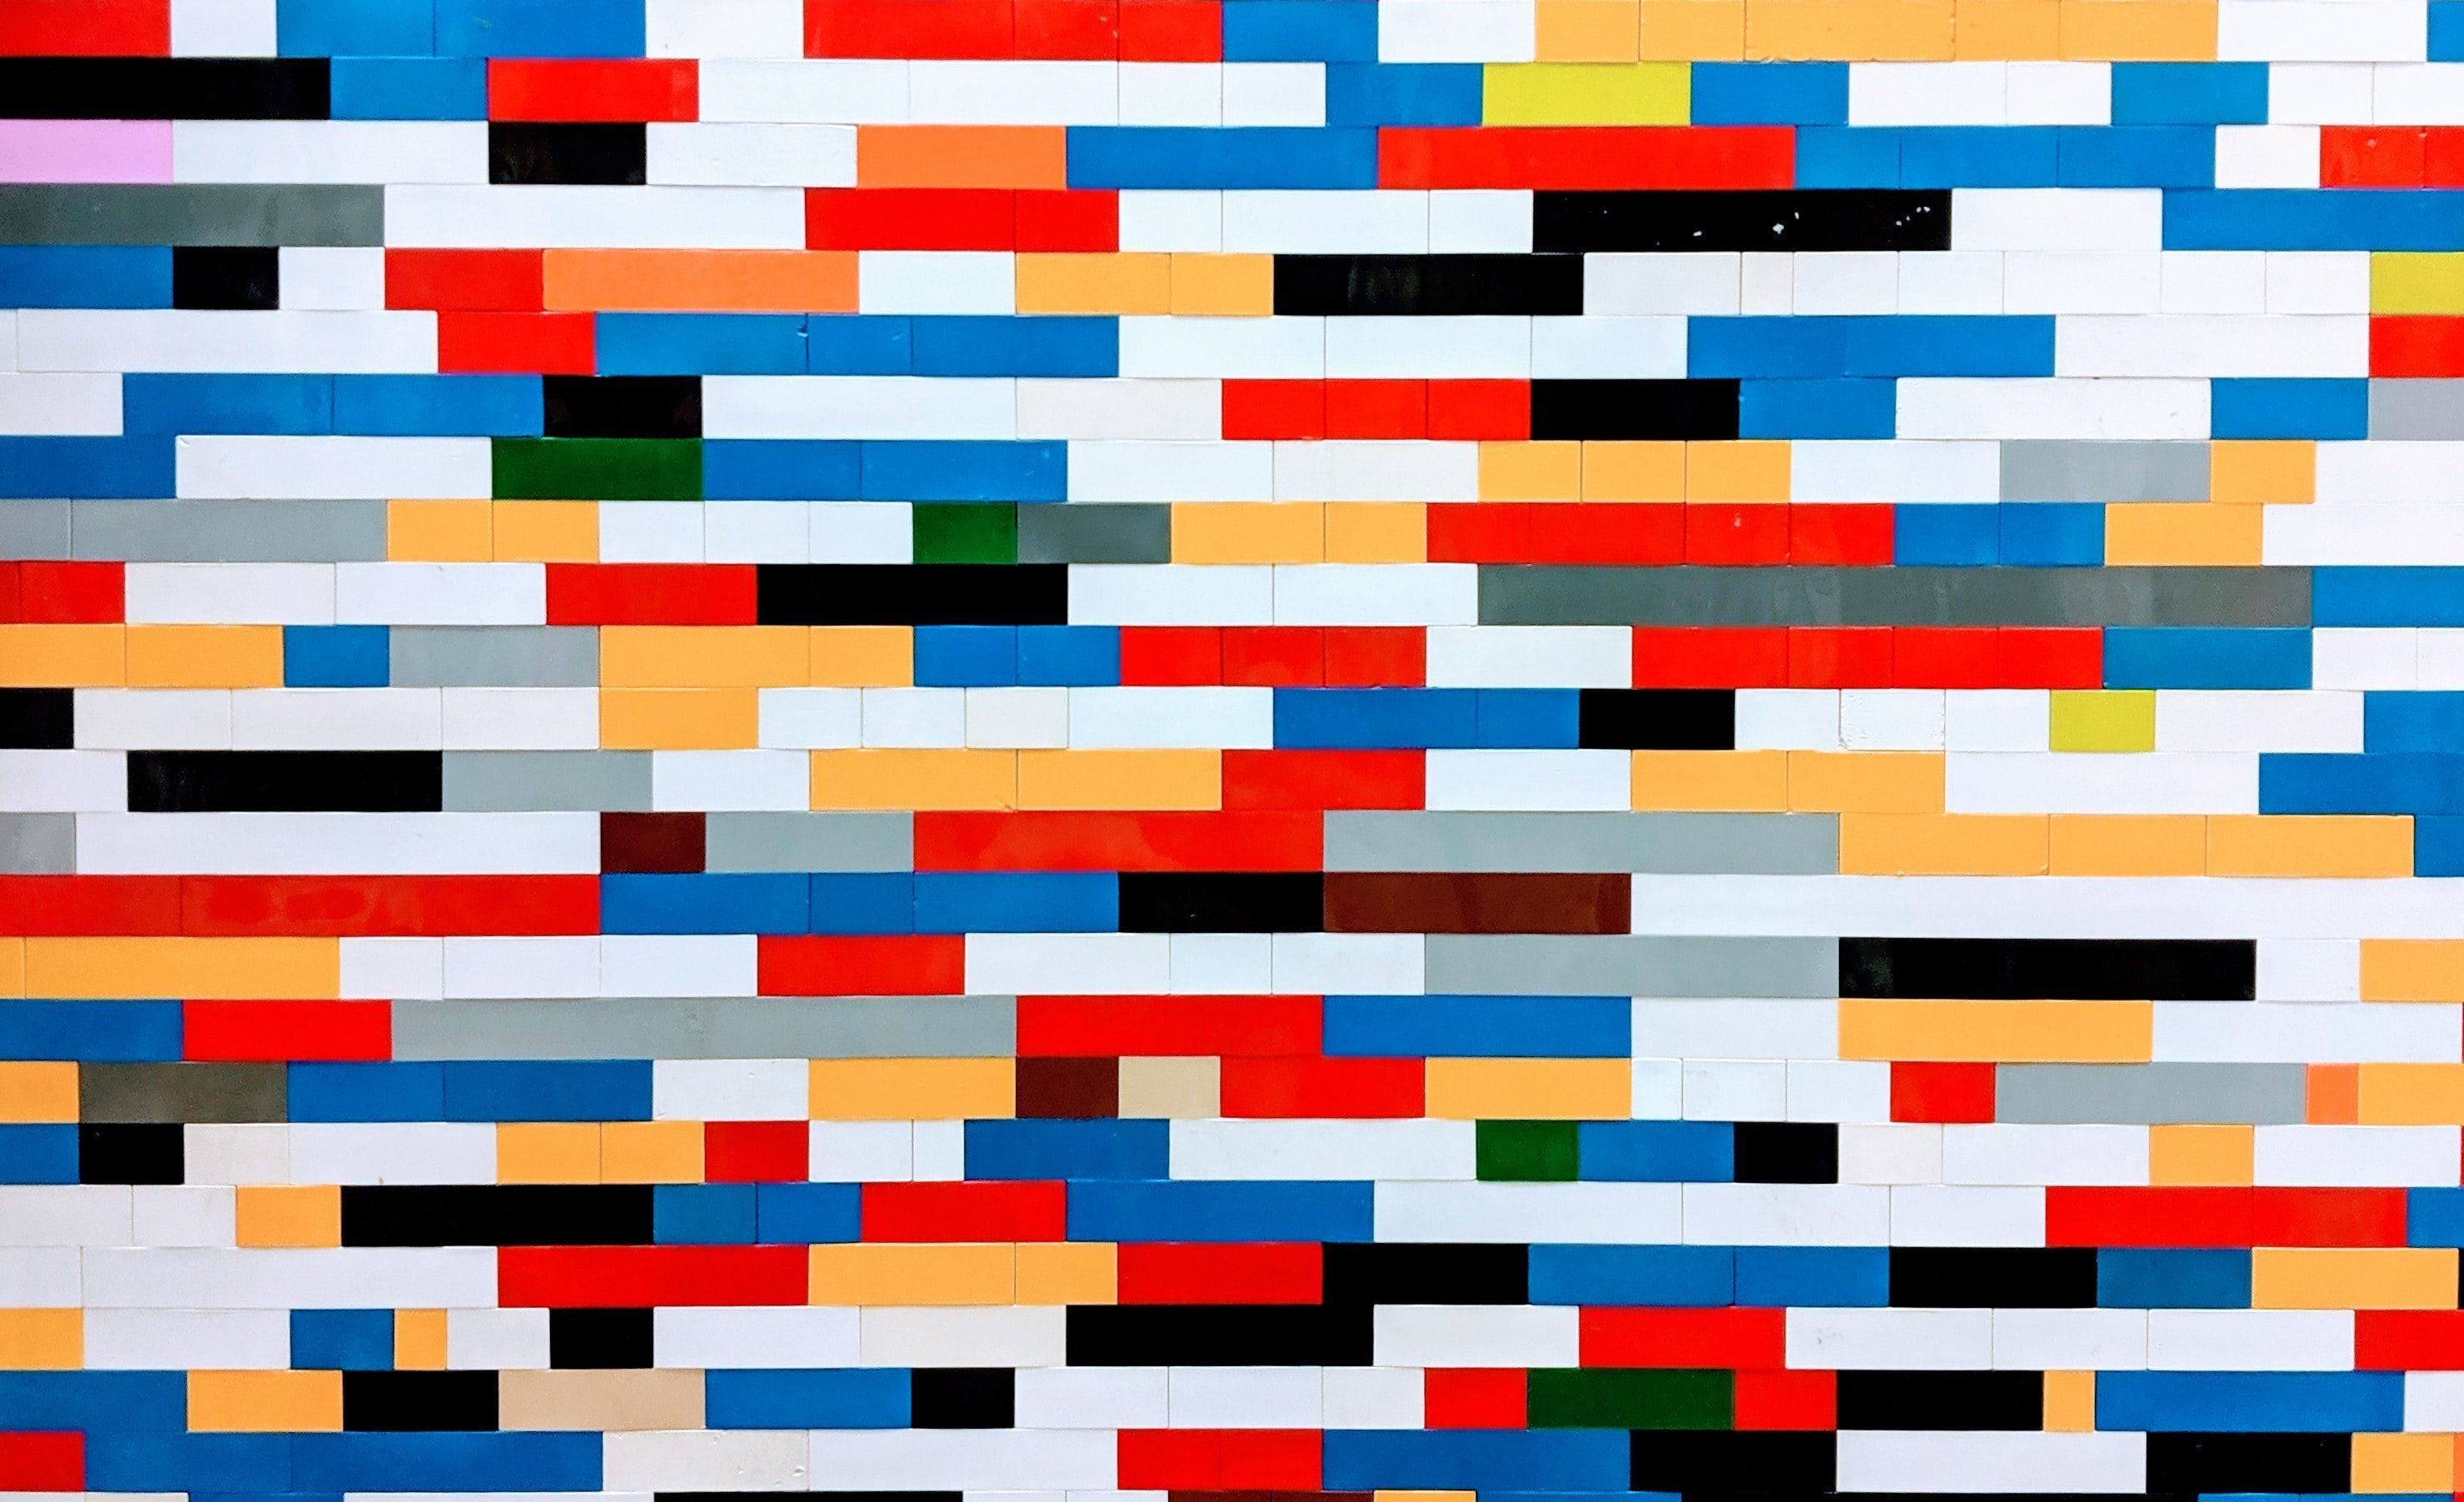 Coloured bricks of lego